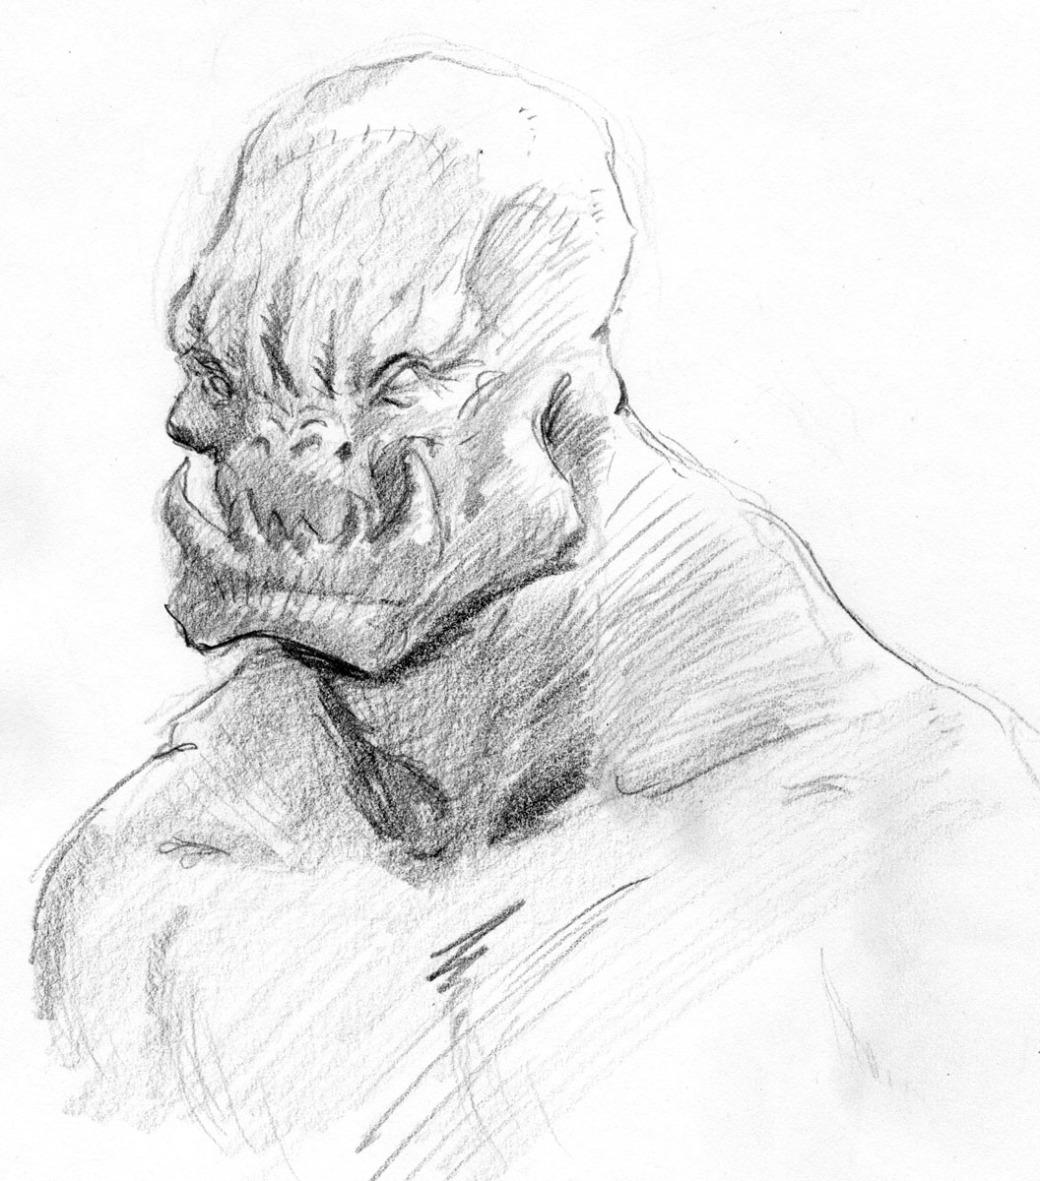 joshhagen_preplay_sketch1